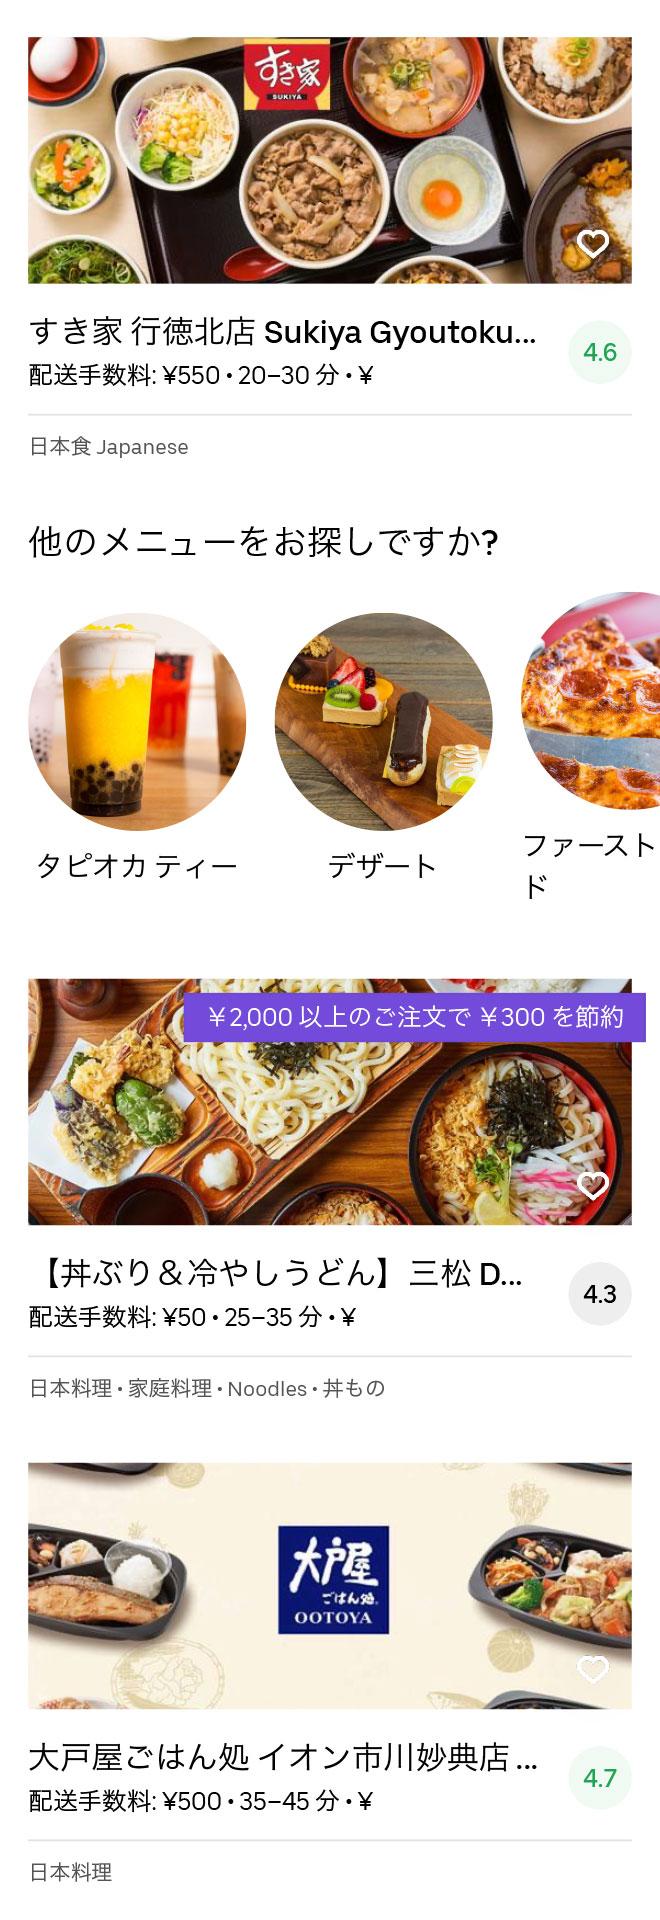 Funabashi nishi menu 2004 05